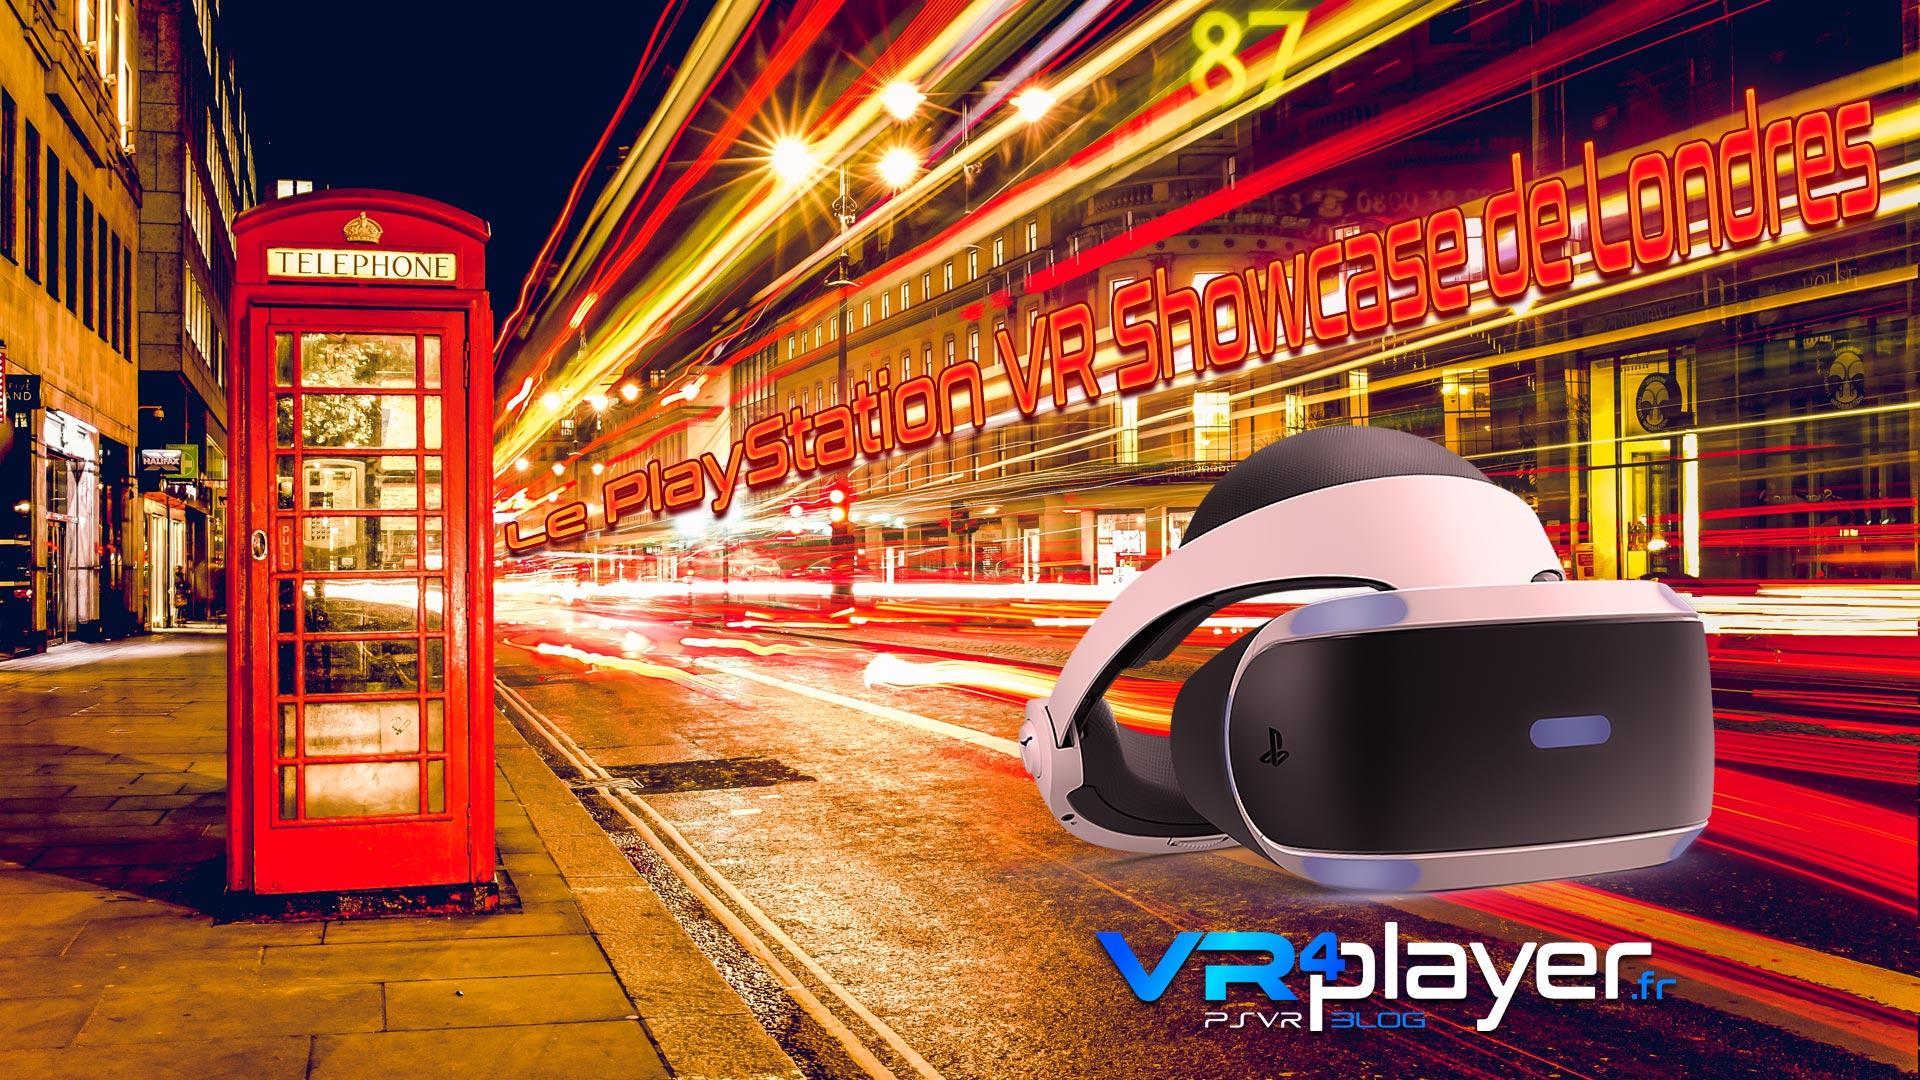 PlayStation VR London Showcase vrplayer.fr